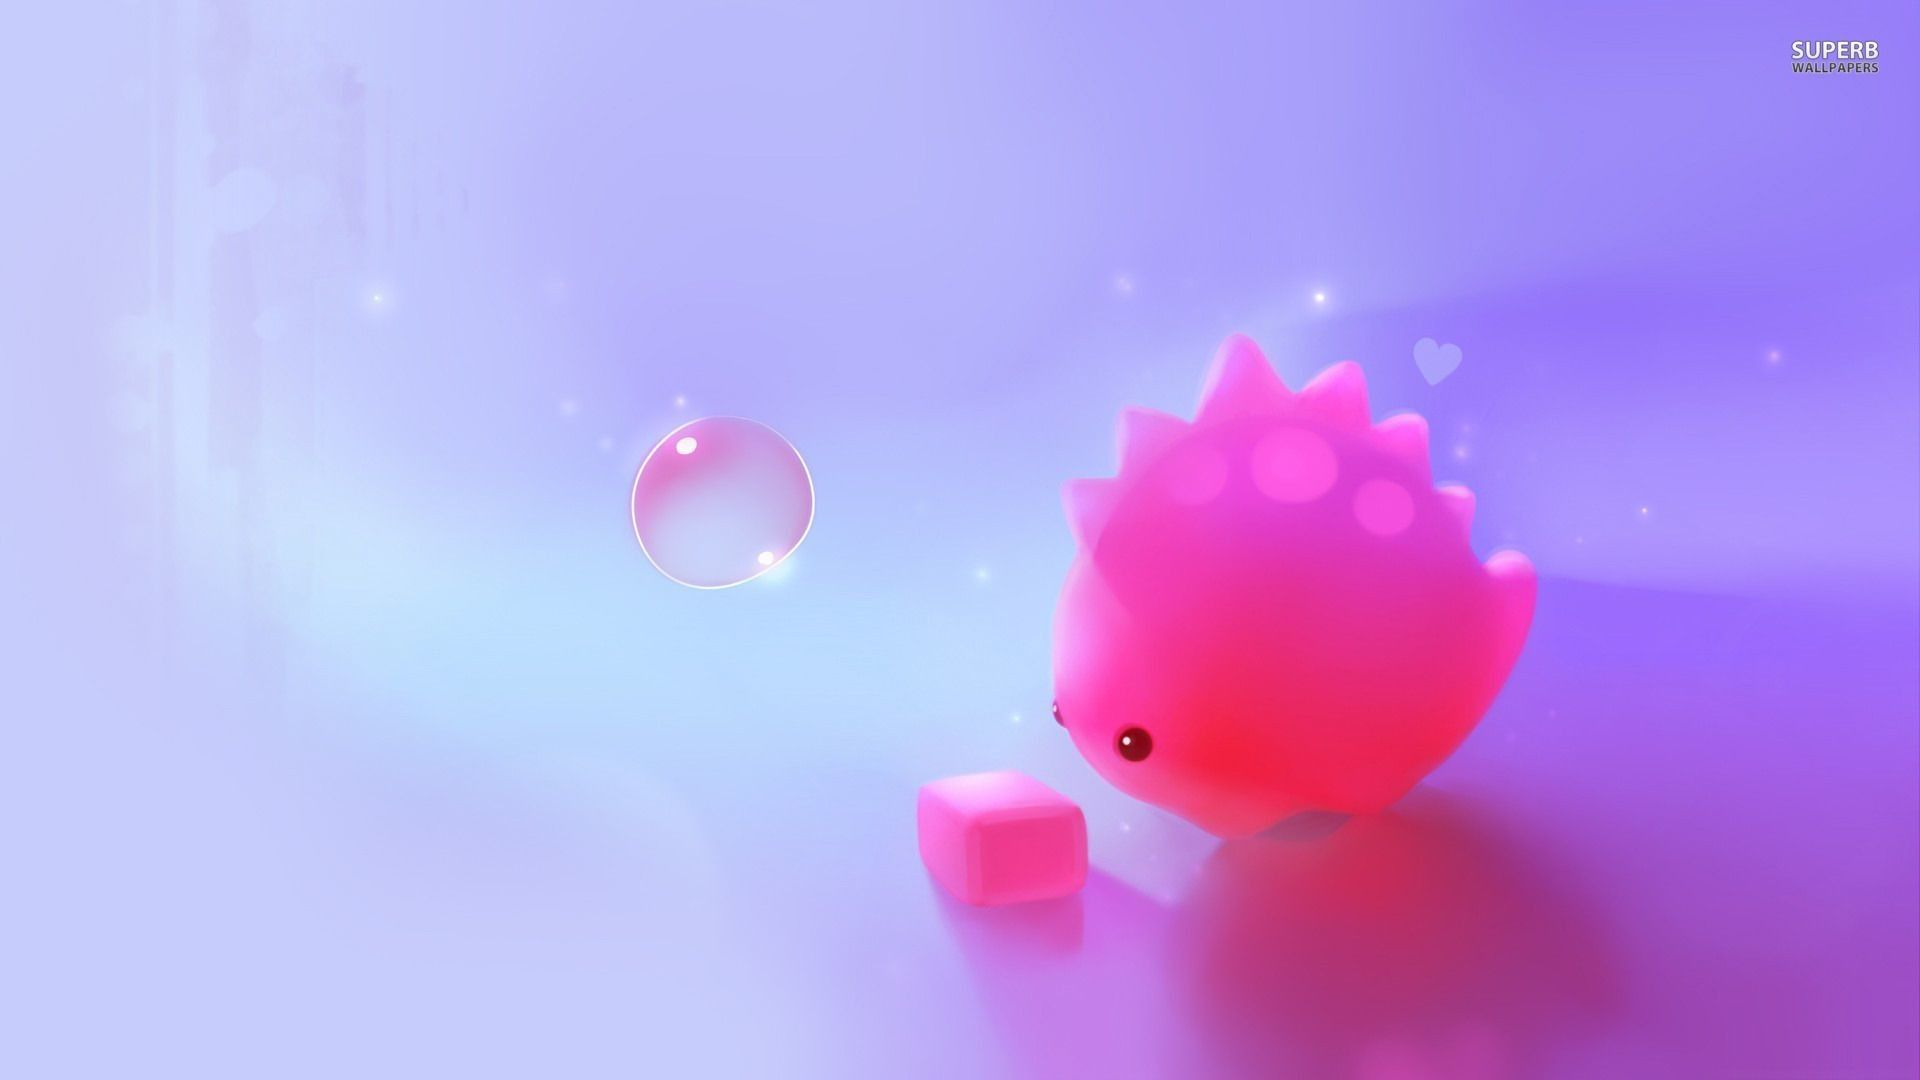 1920x1080 Kawaii Candy hình nền